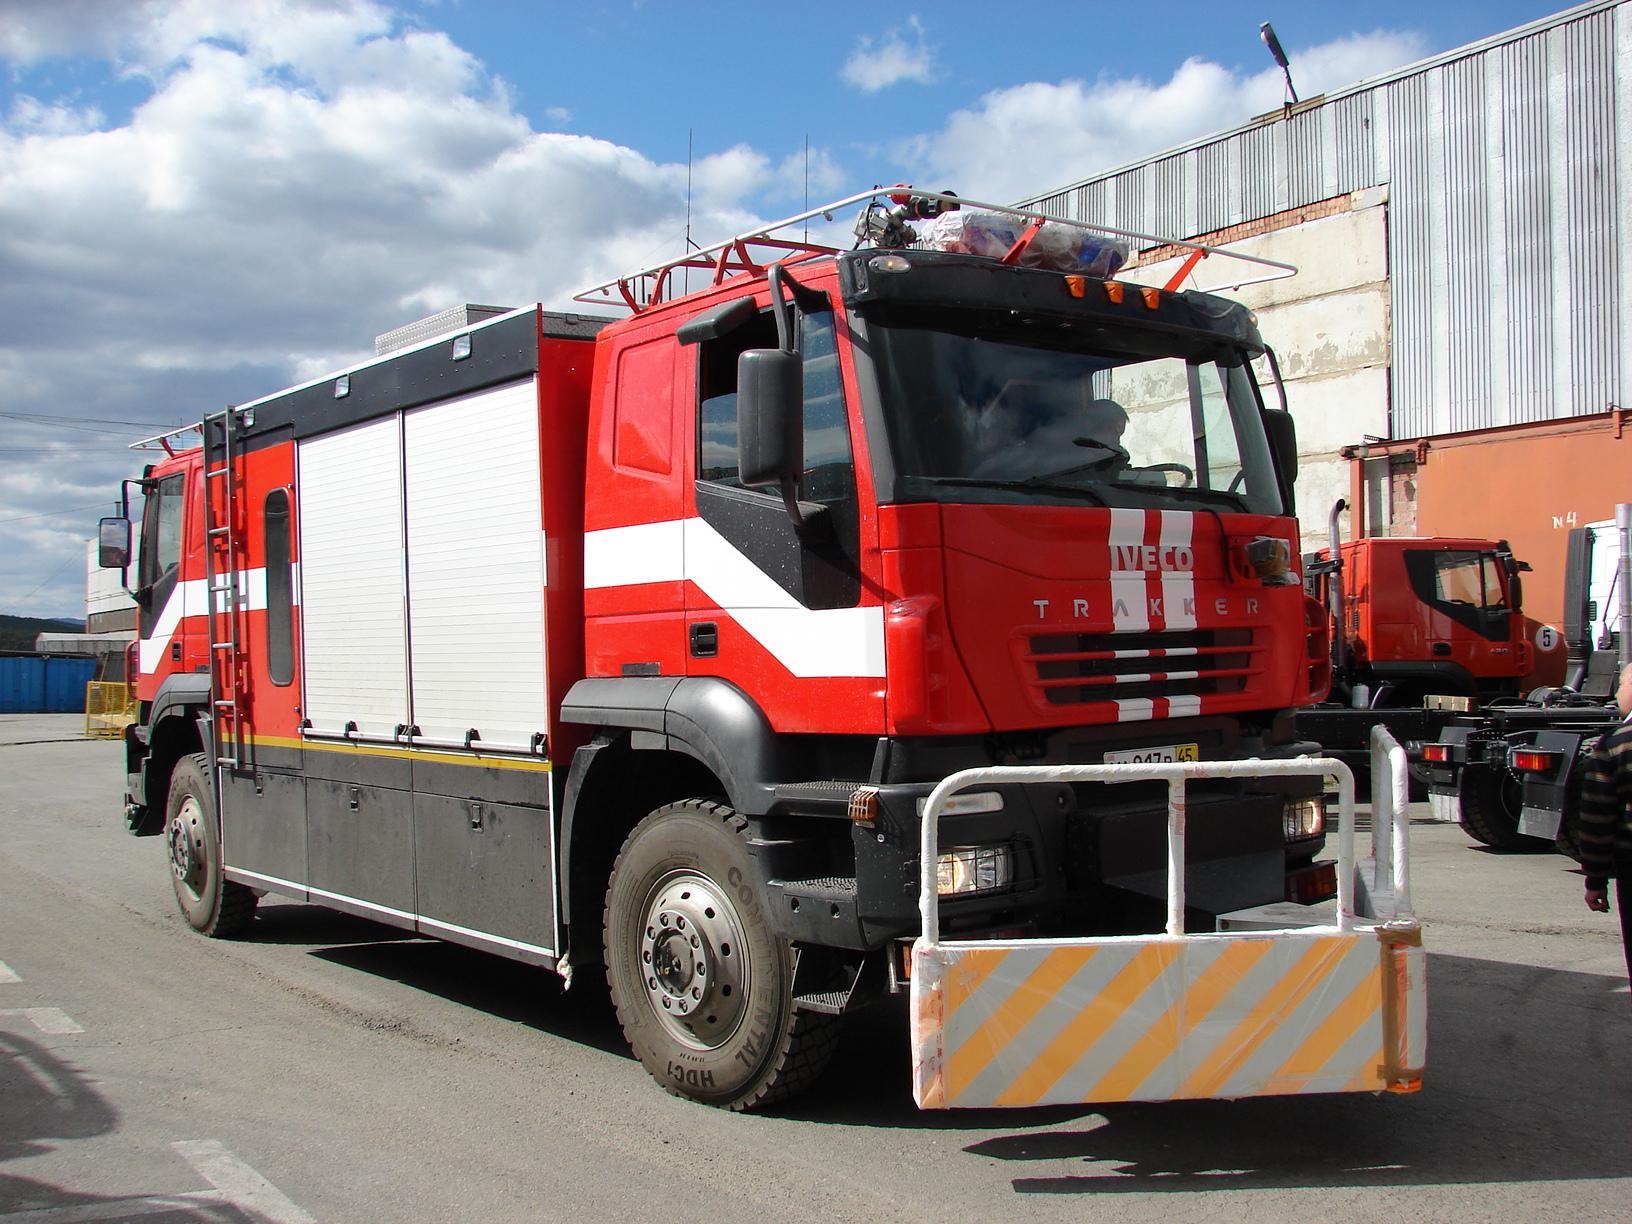 IVECO-AMT_Trakker-Firefighters